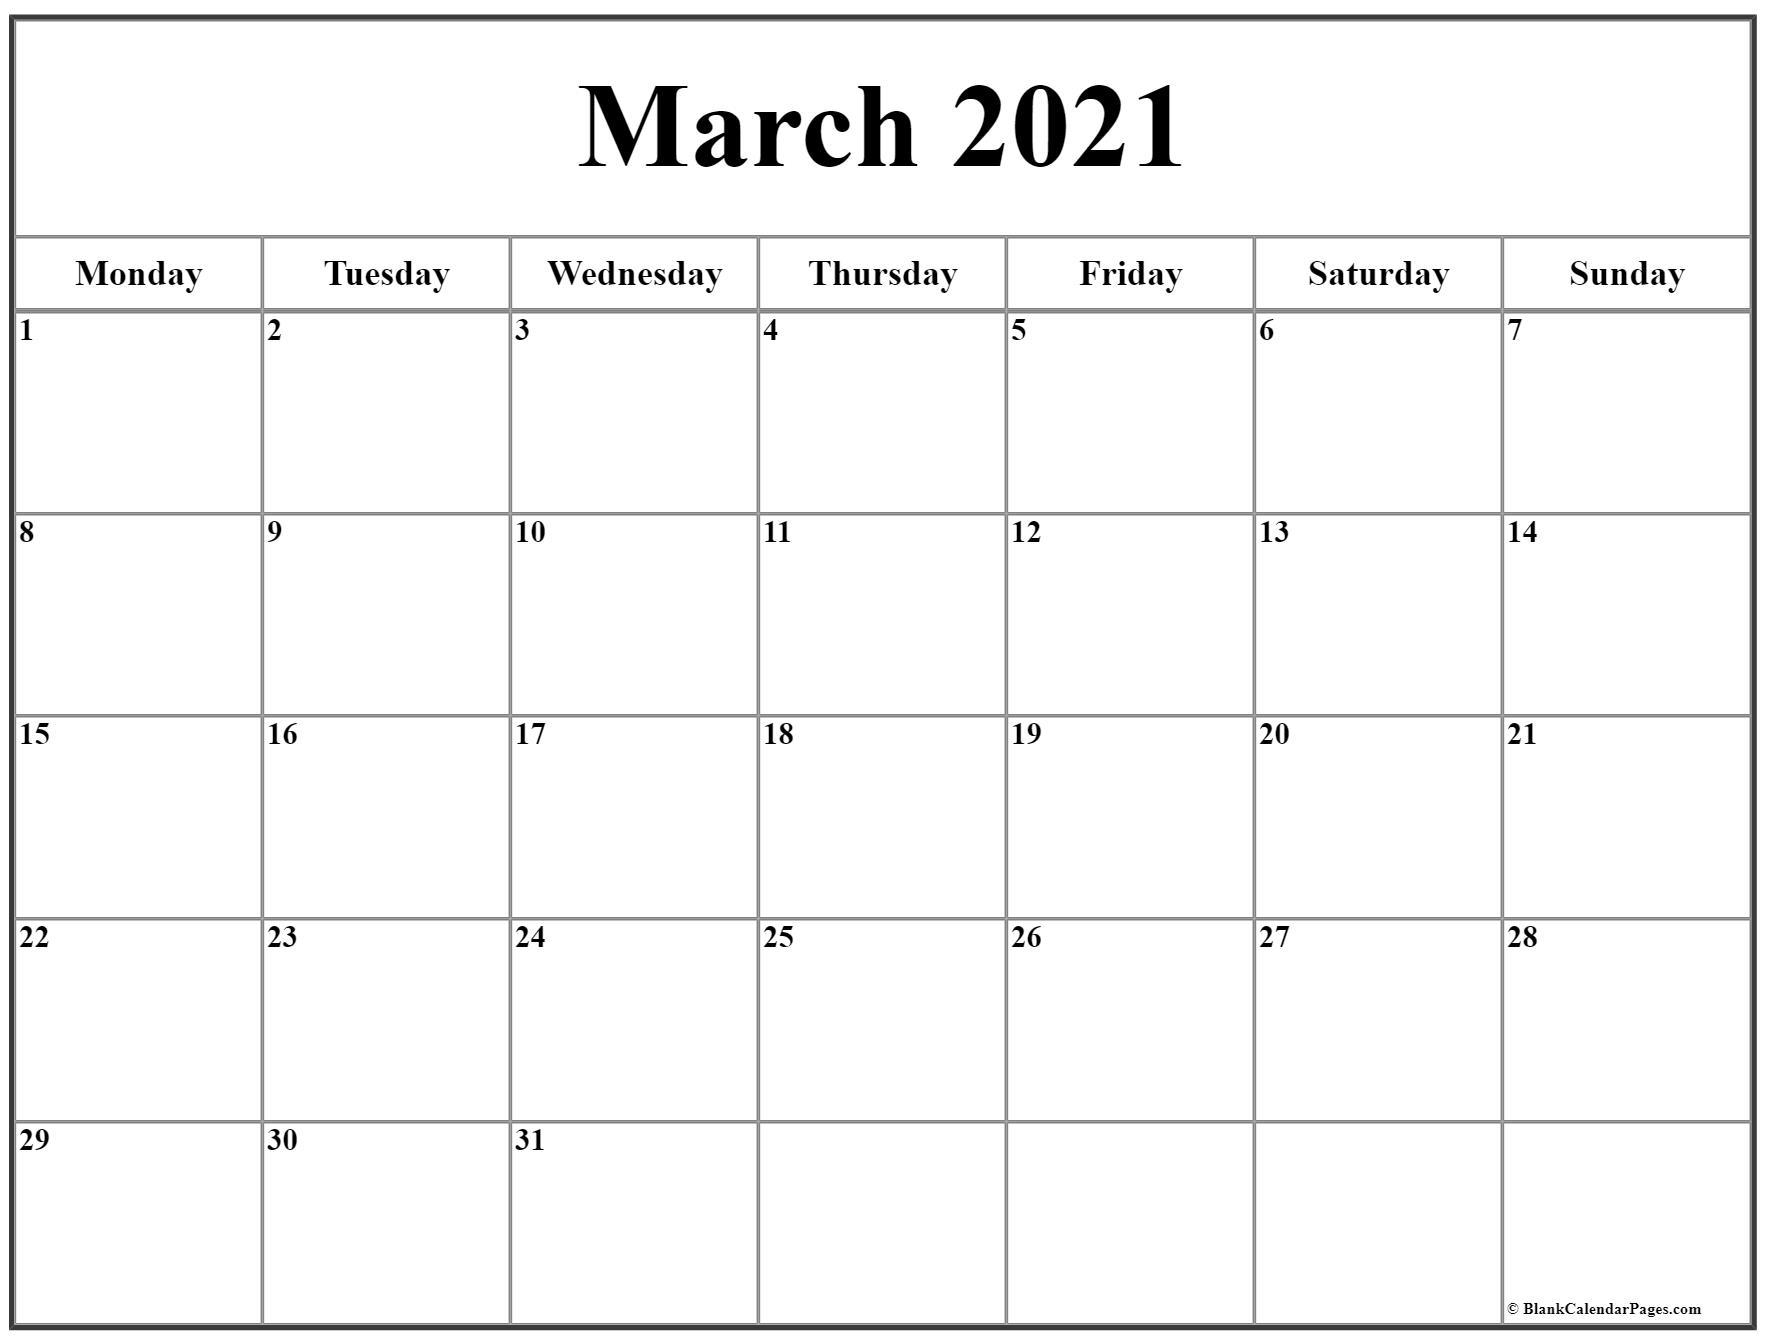 Get Blank Calendar 2021Monday To Sunday